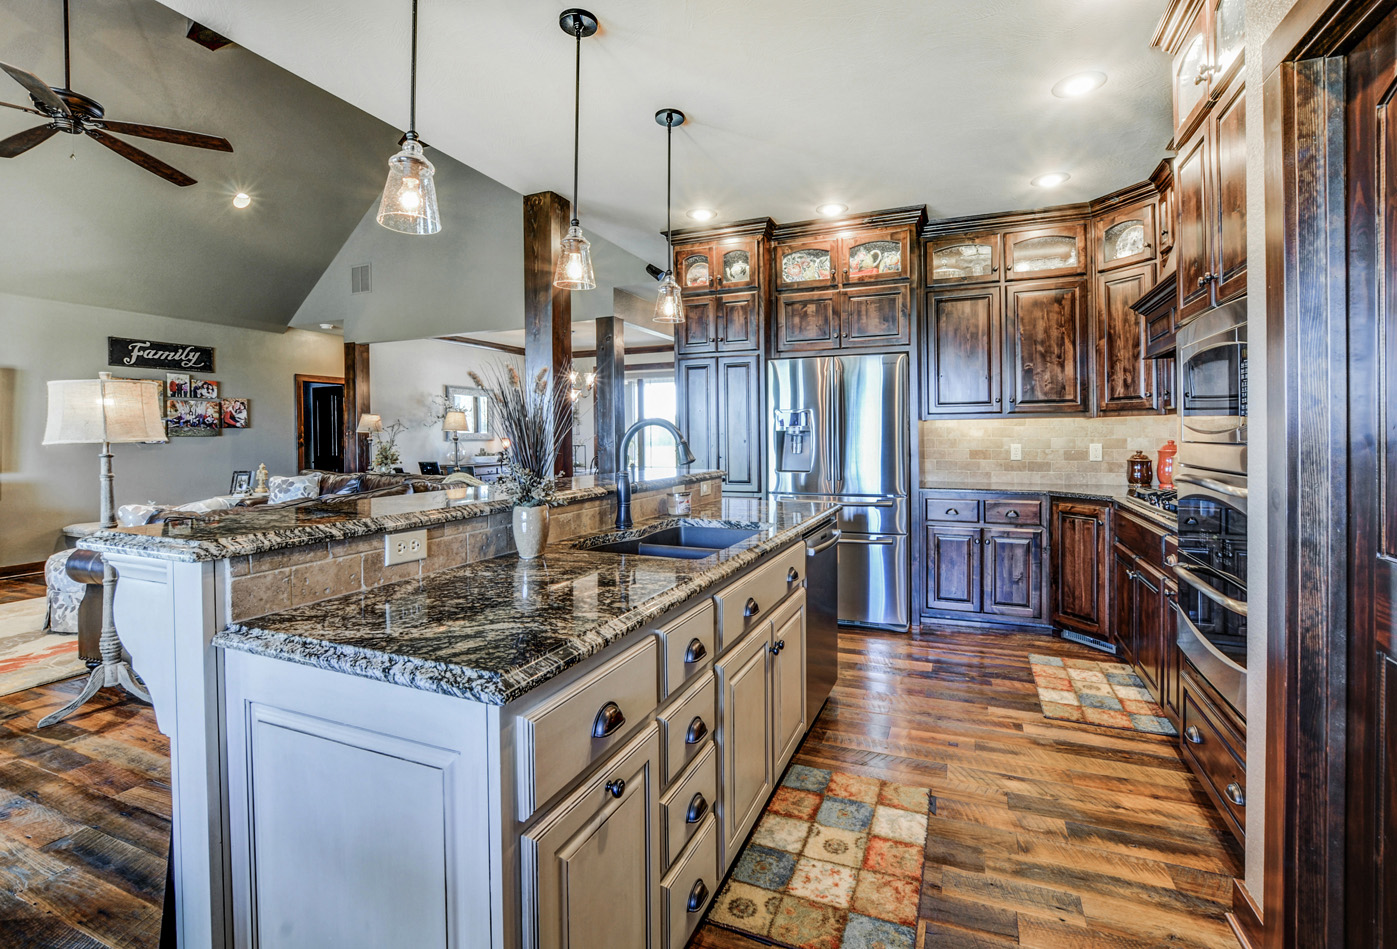 built-by-brett-custom-home-springfield-mo-rte-353-ww-010.jpg